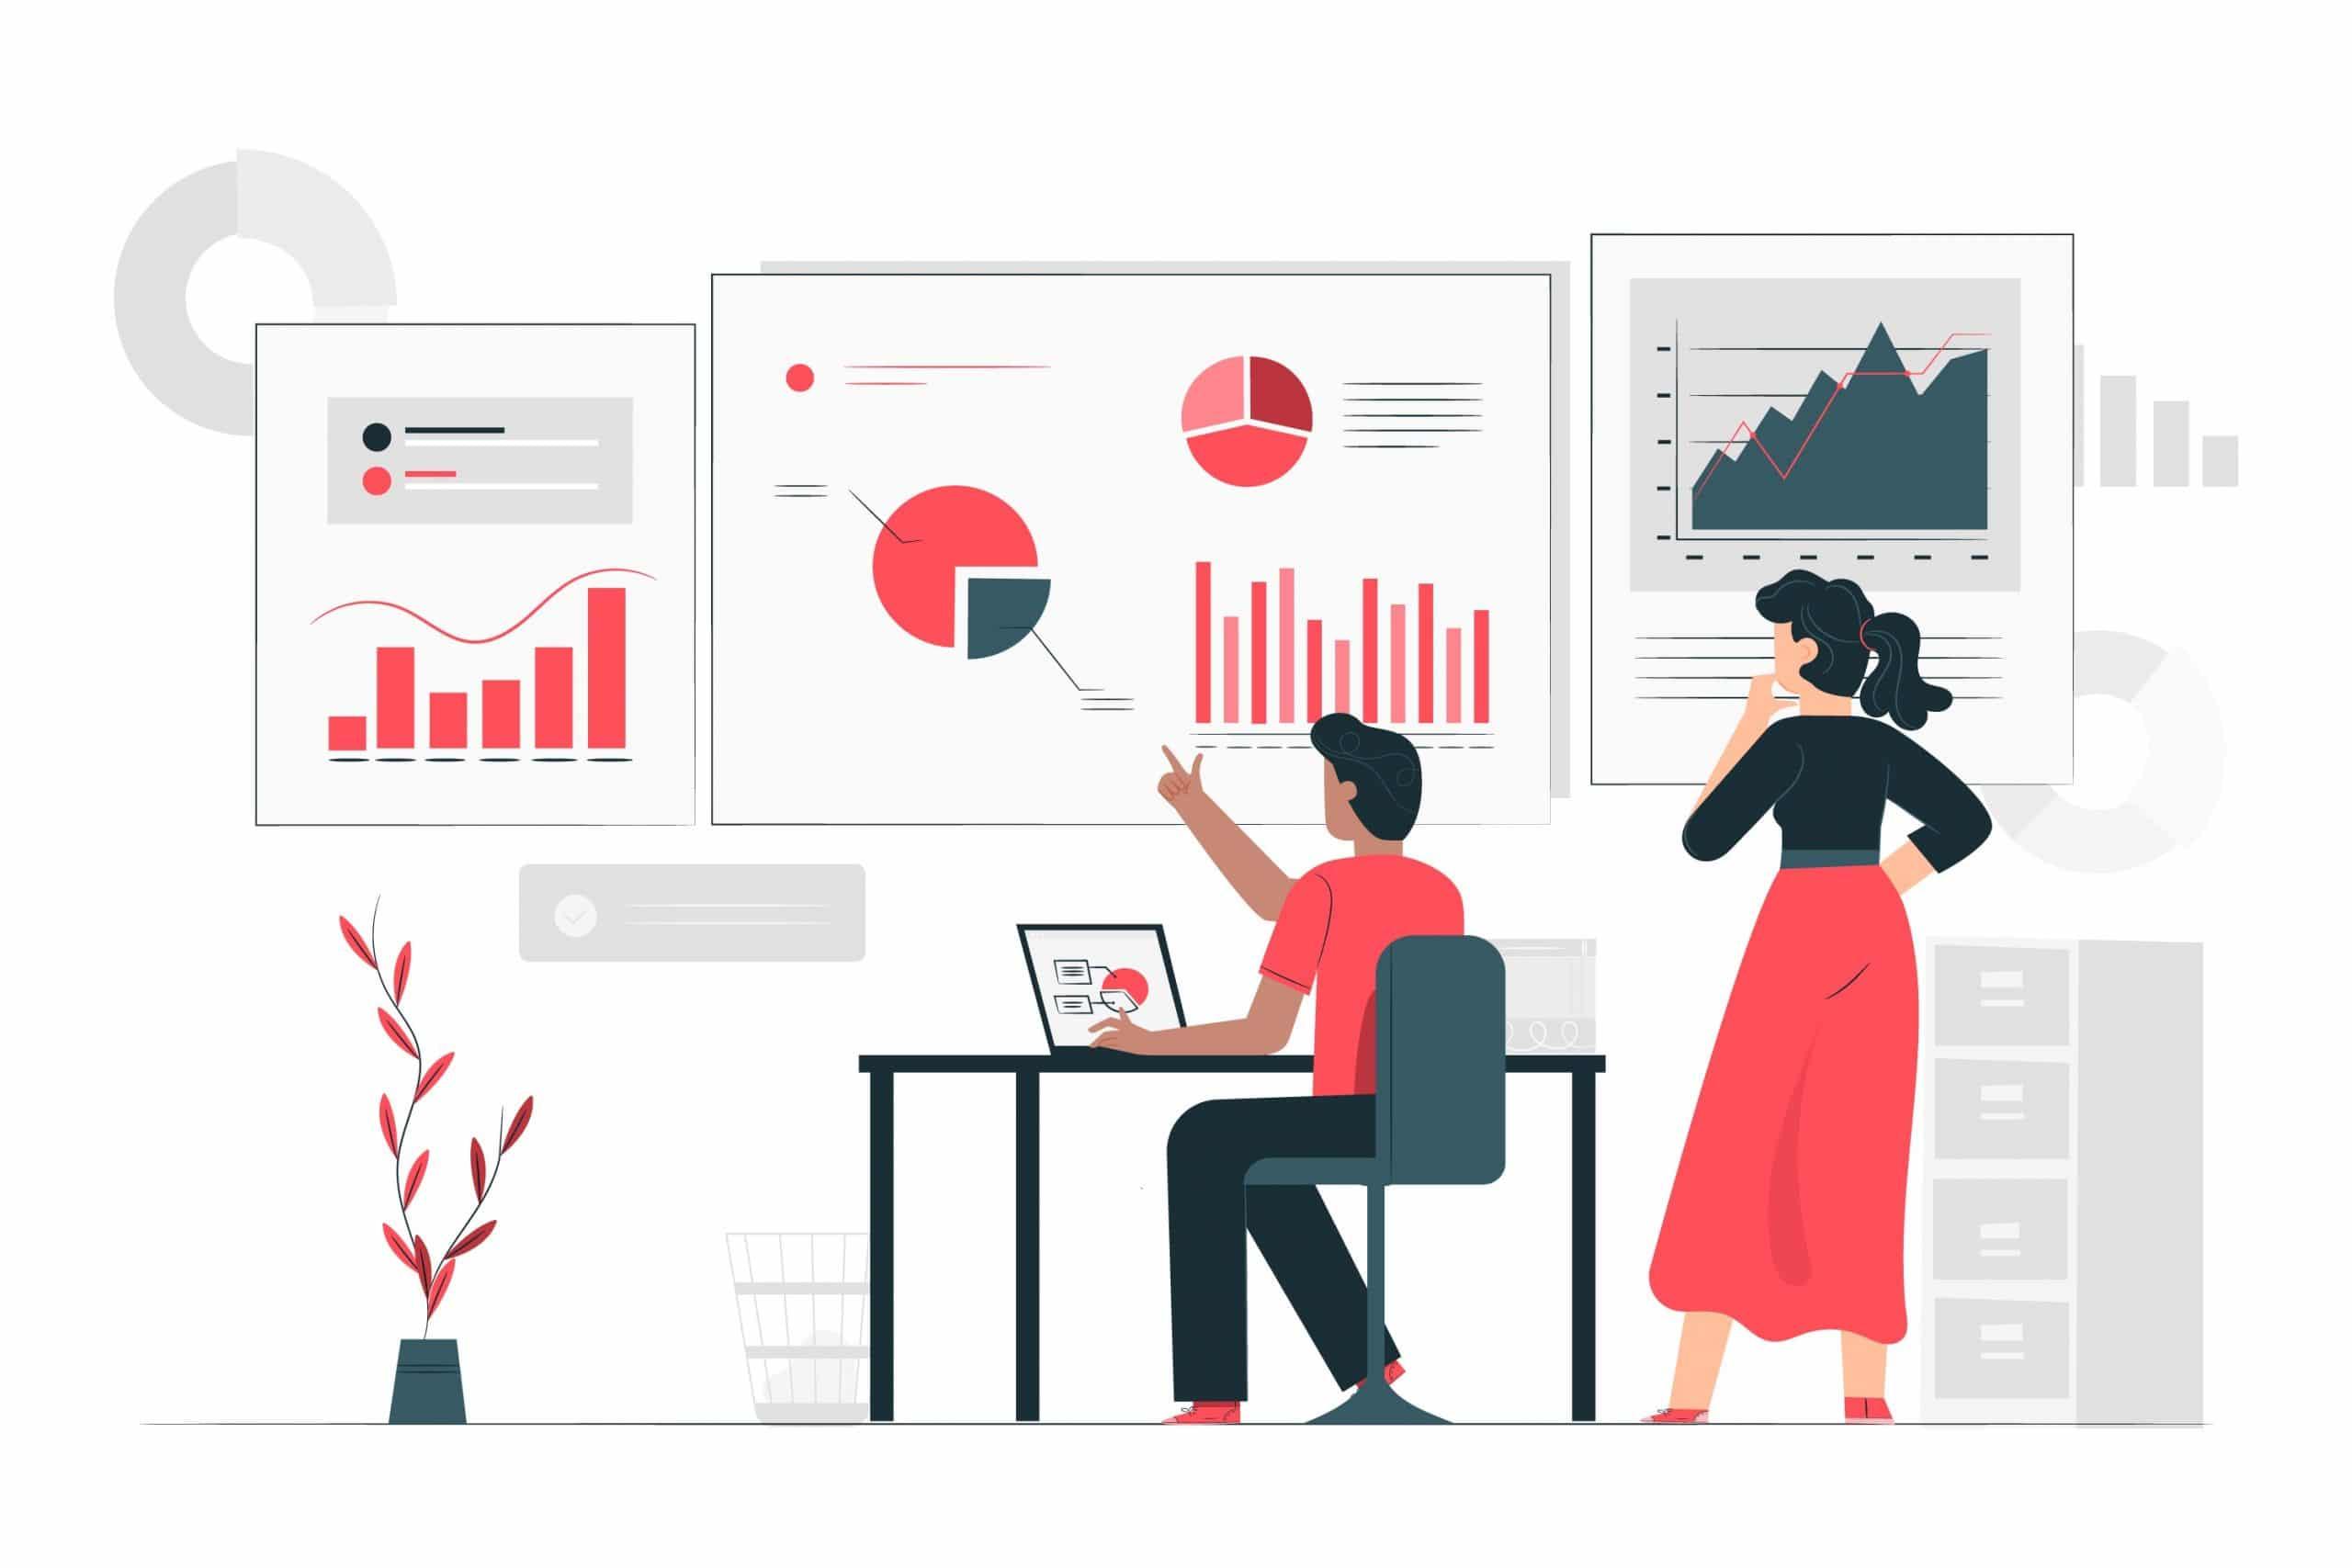 اسکریپت ارسال گزارش خلاصه اکانت گوگل ادز به Google Sheets